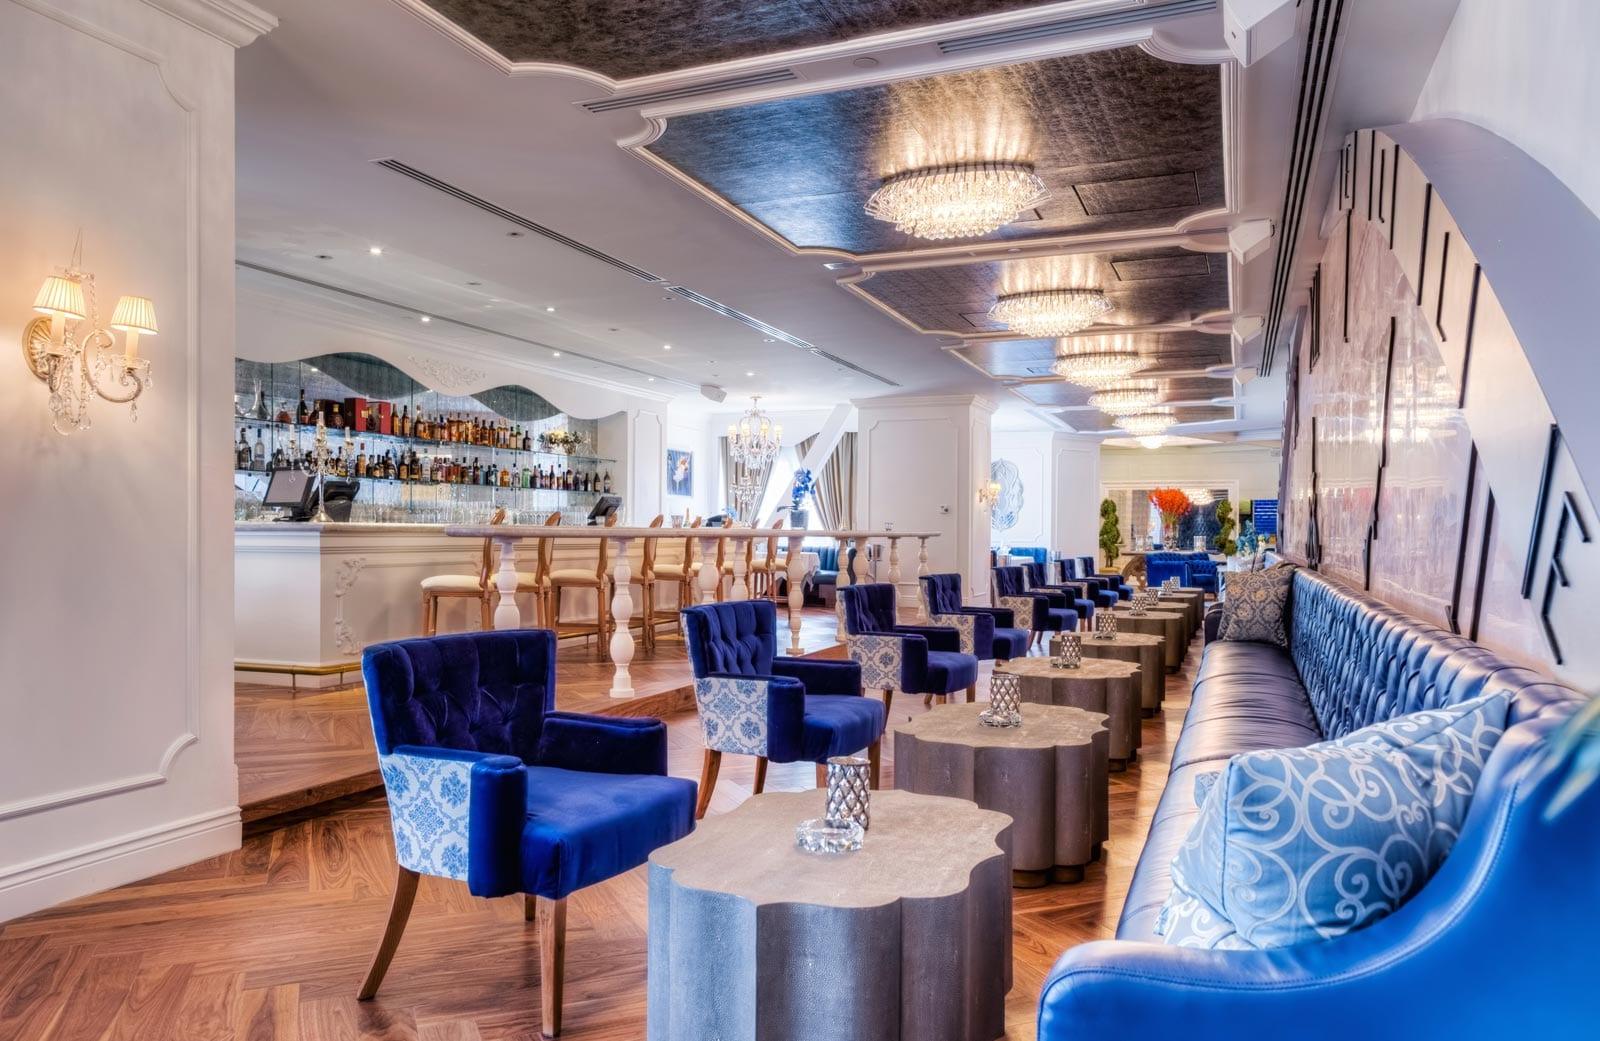 bagatelle - nightclub design, bar & restaurant designbig time